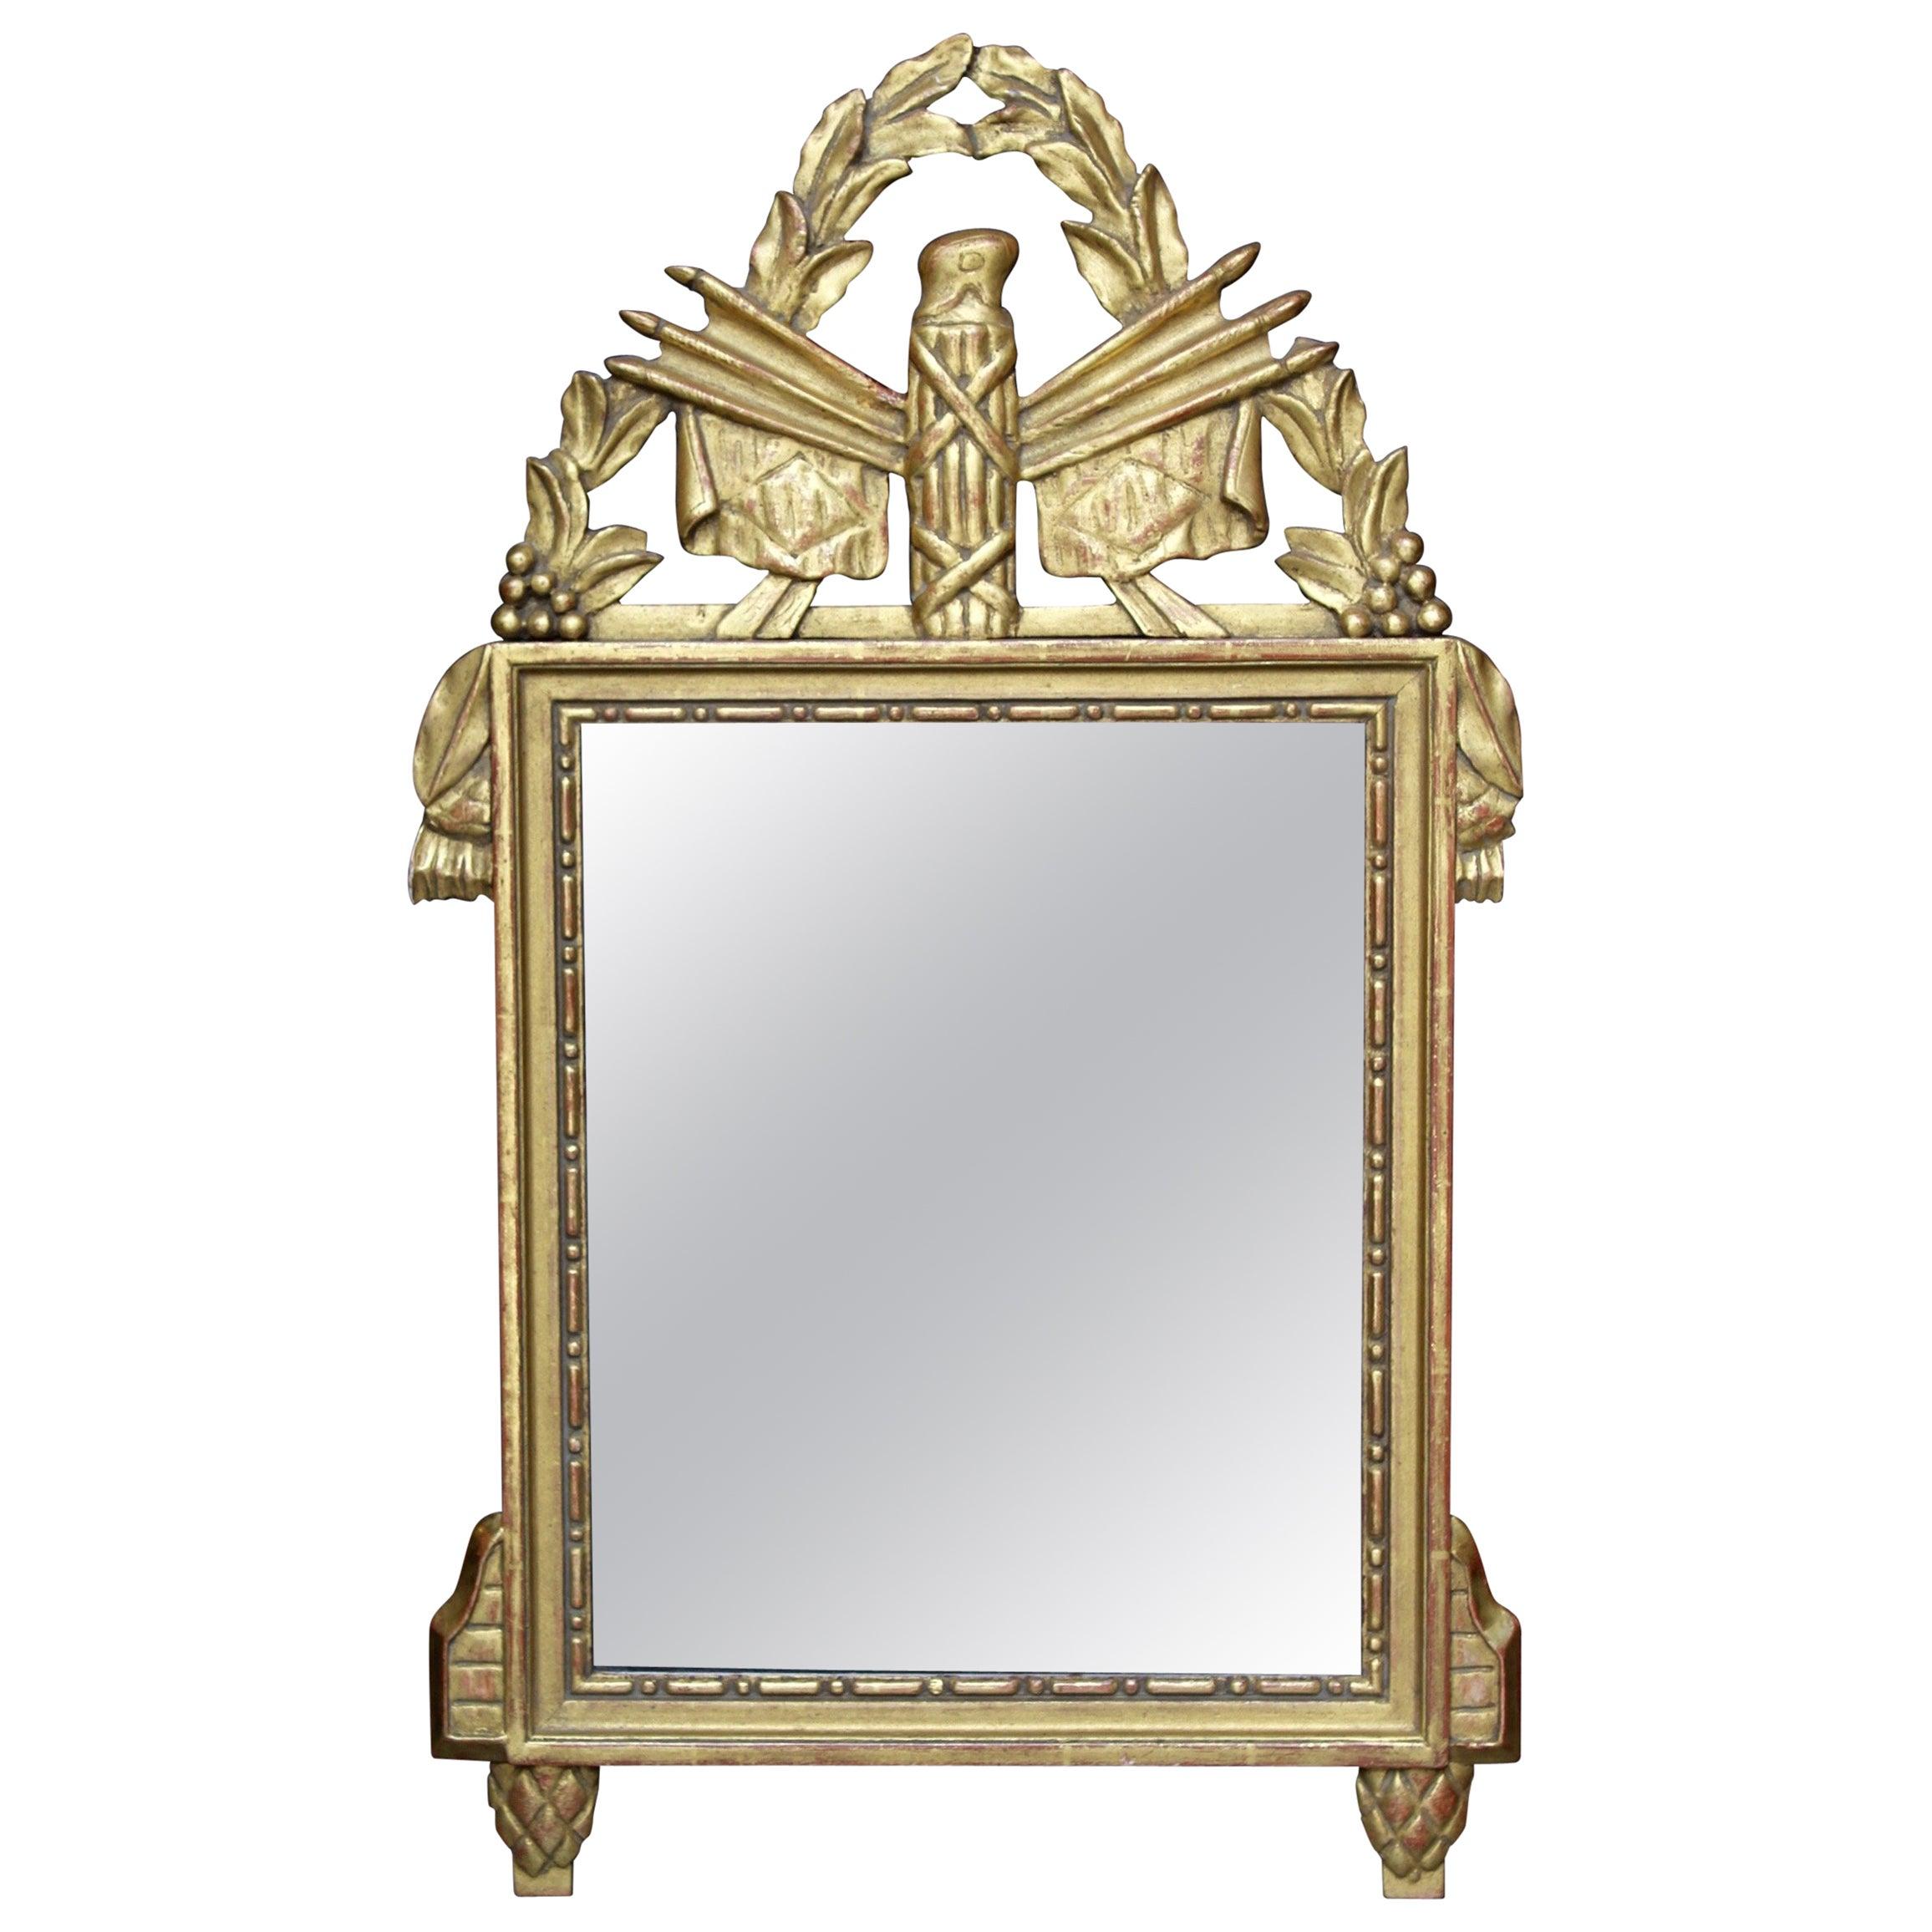 18th century French Directoire Period Mirror